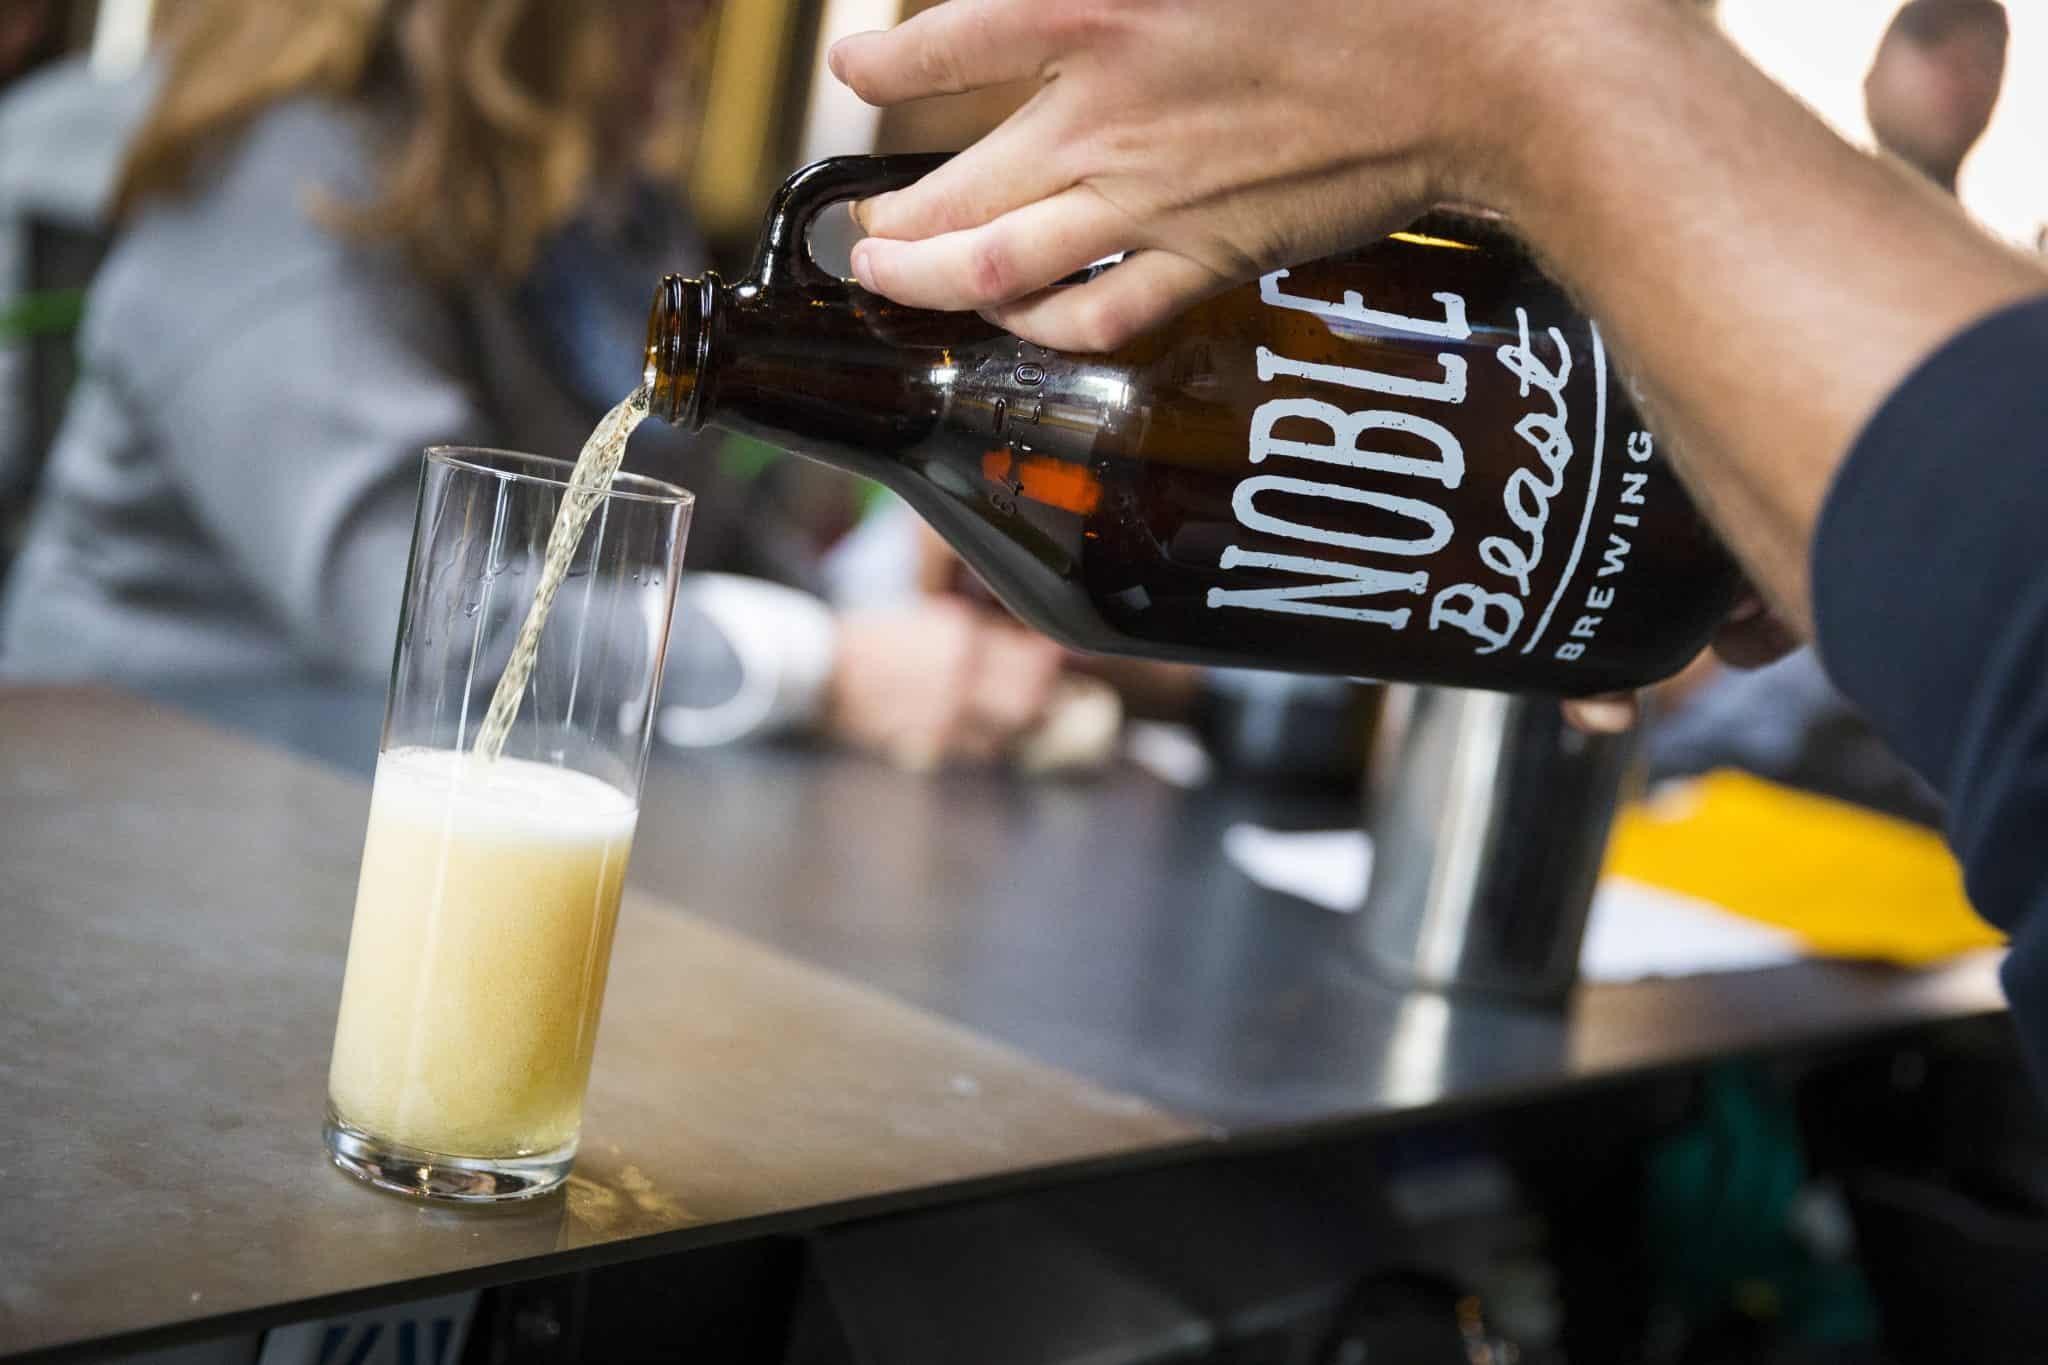 Noble Beast Brewery 2017 original (c) Cody York (18) Cleveland